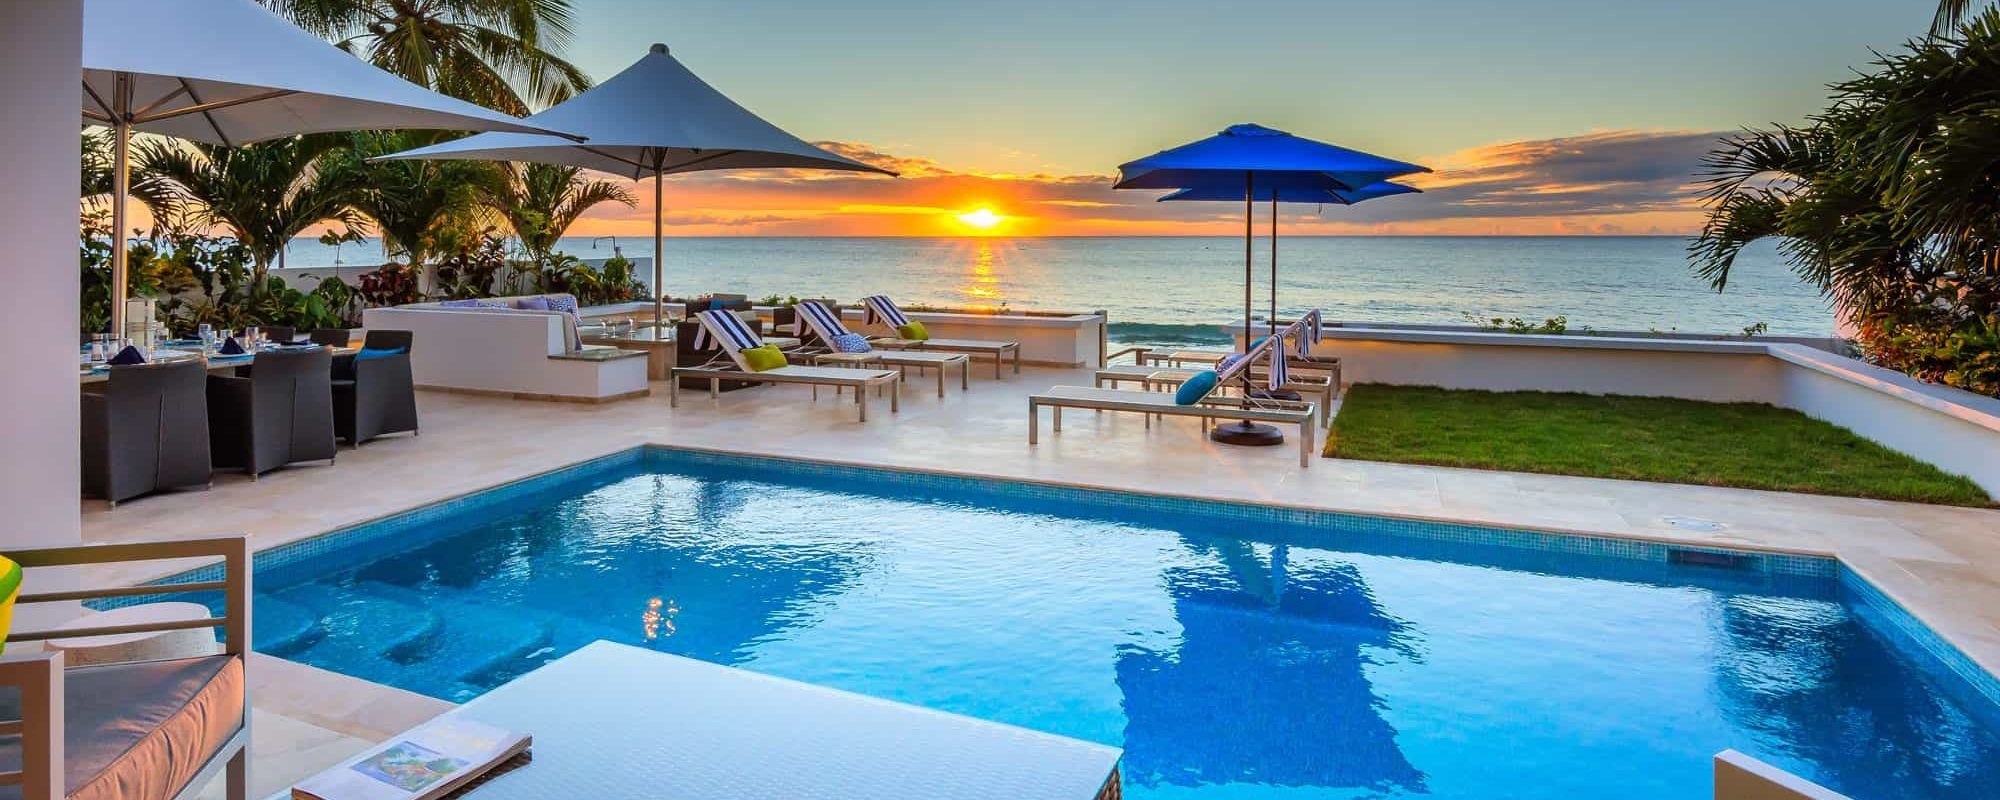 09-sunset-pool_